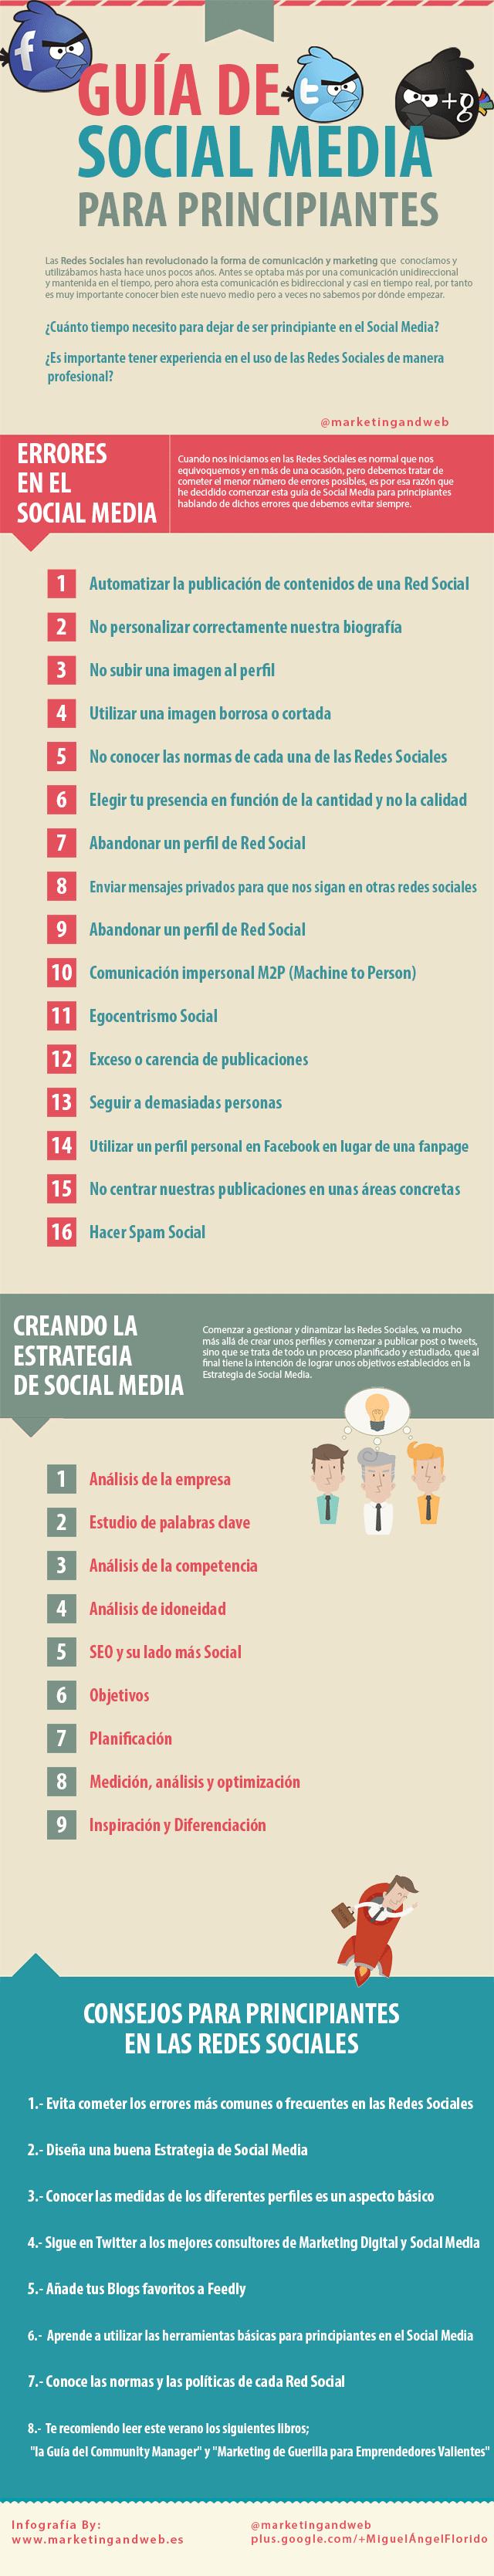 social media principiantes Guía de Social Media para principiantes